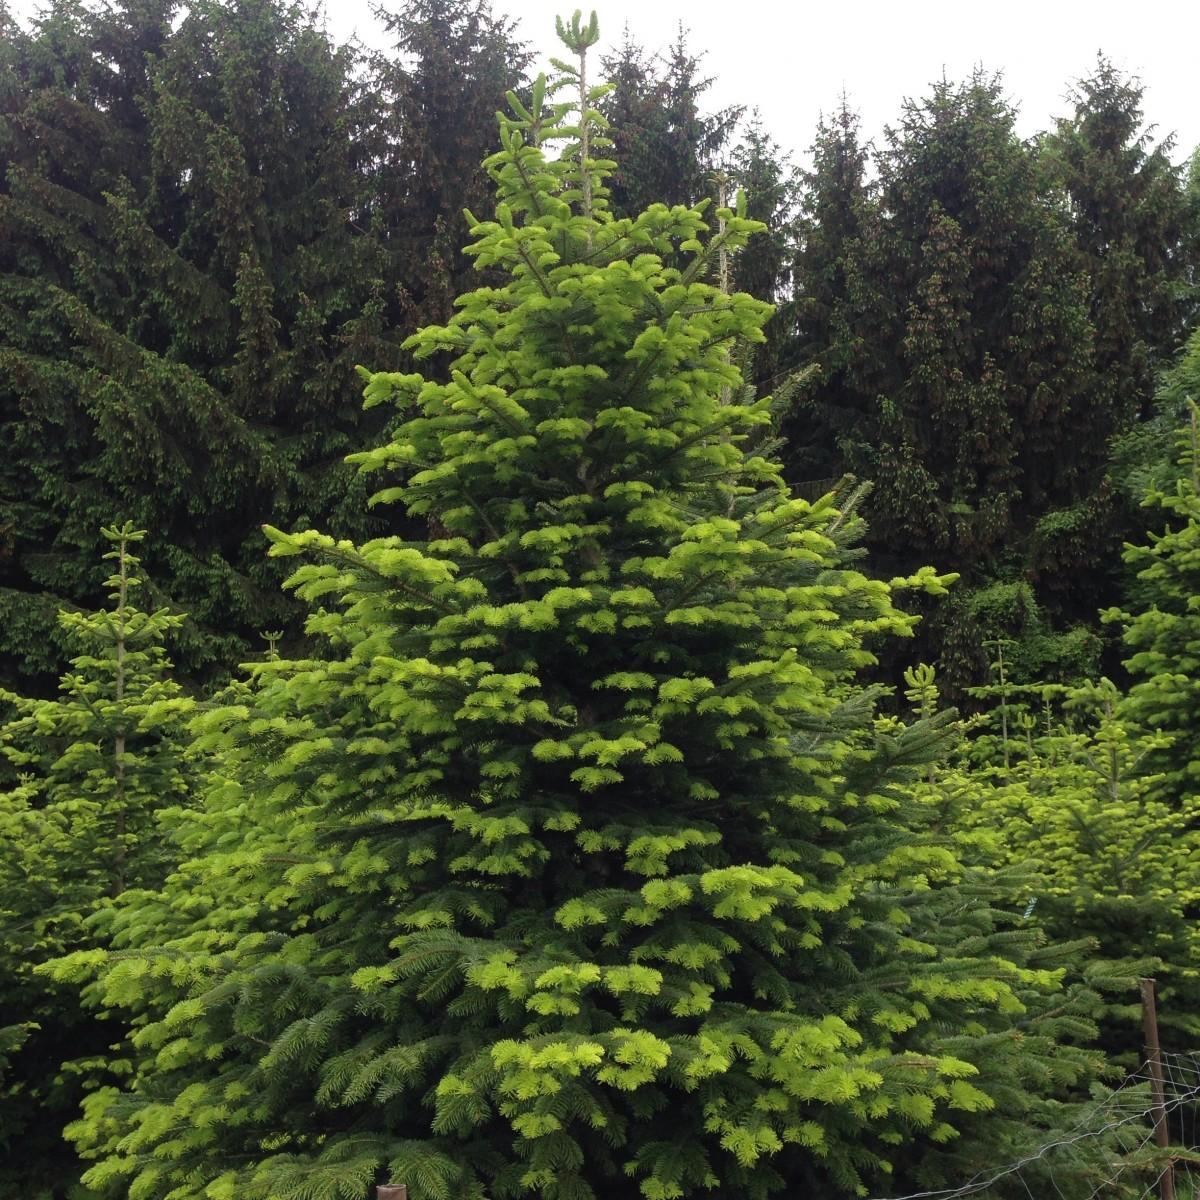 Images gratuites arbre branche feuilles persistantes - Arbres a feuilles caduques ...